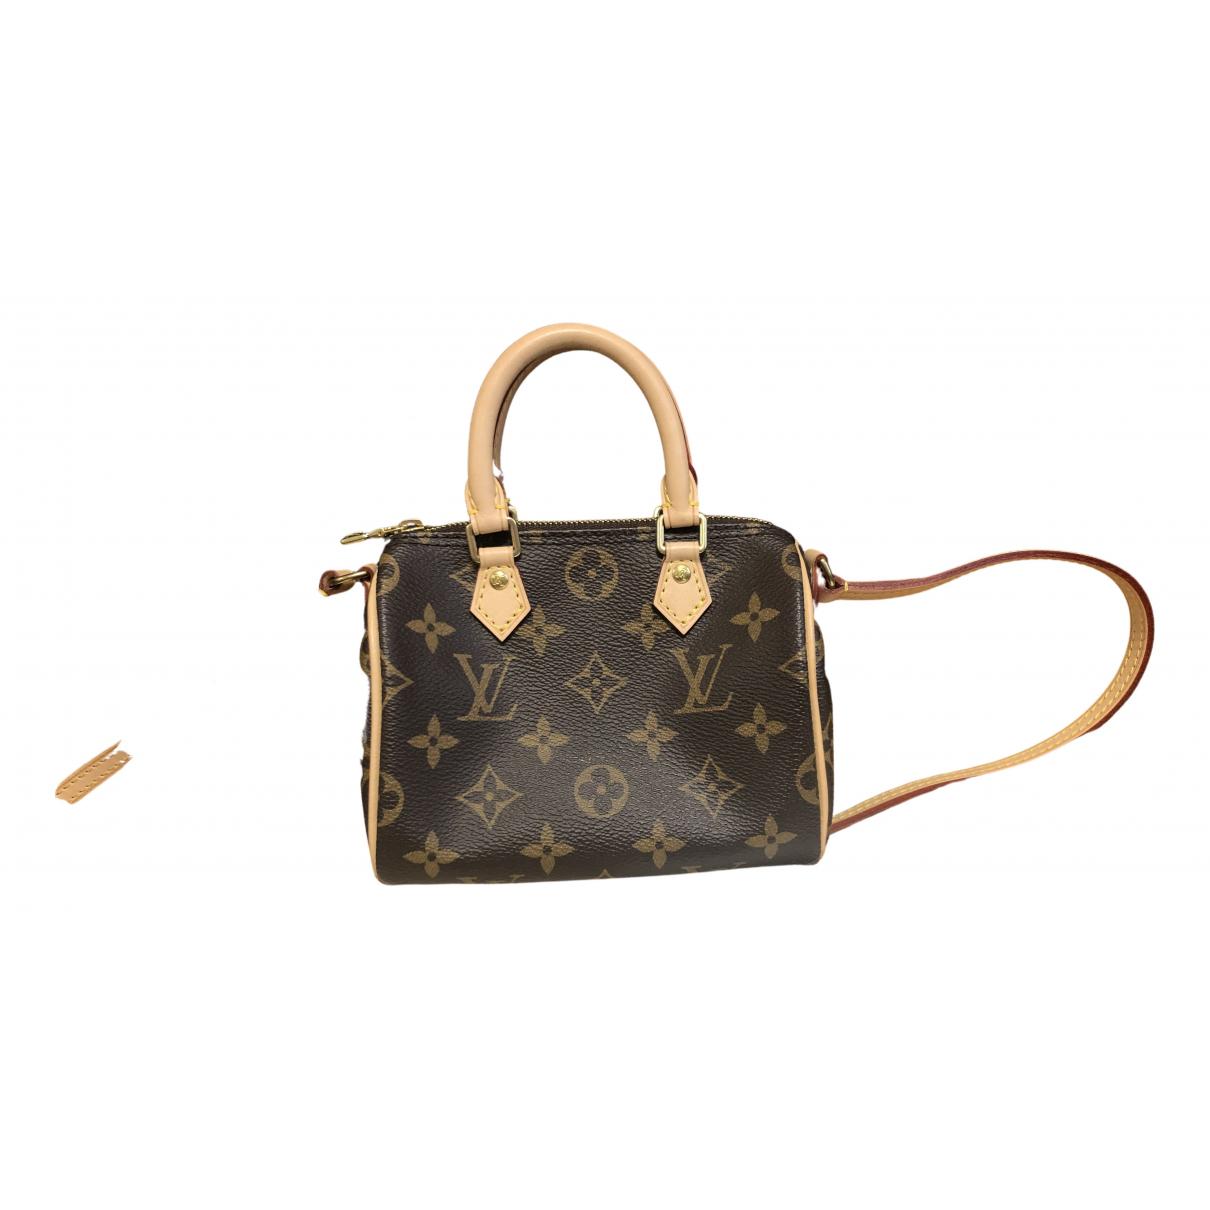 Louis Vuitton - Sac a main Nano Speedy / Mini HL pour femme en toile - marron